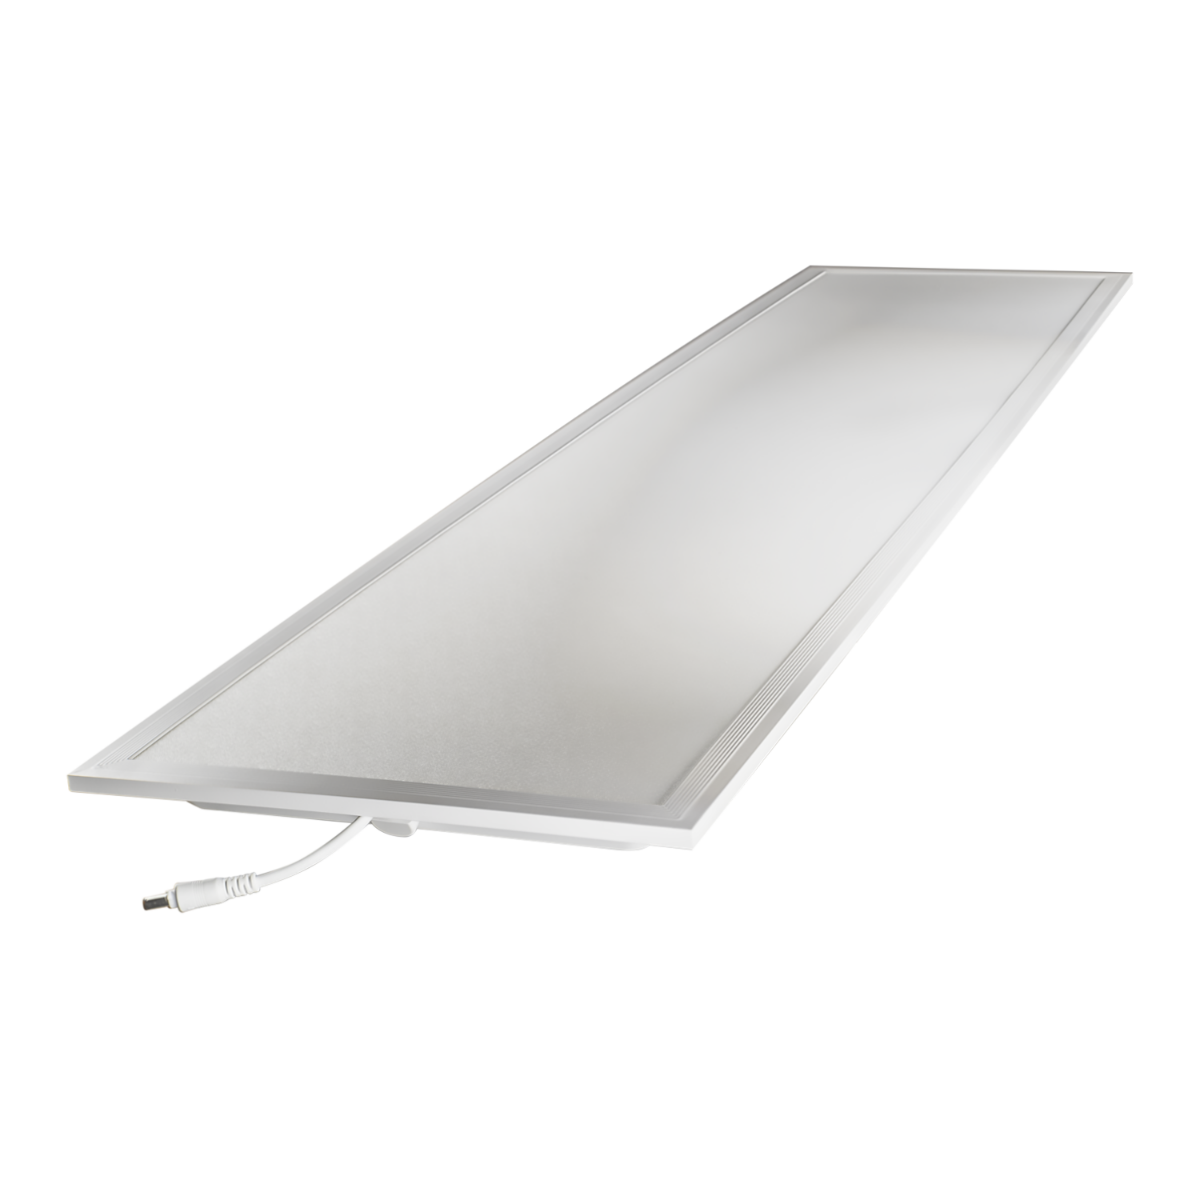 Noxion LED Panel Delta Pro V2.0 30W 30x120cm 6500K 4110lm UGR <19 | Daylight - Replaces 2x36W